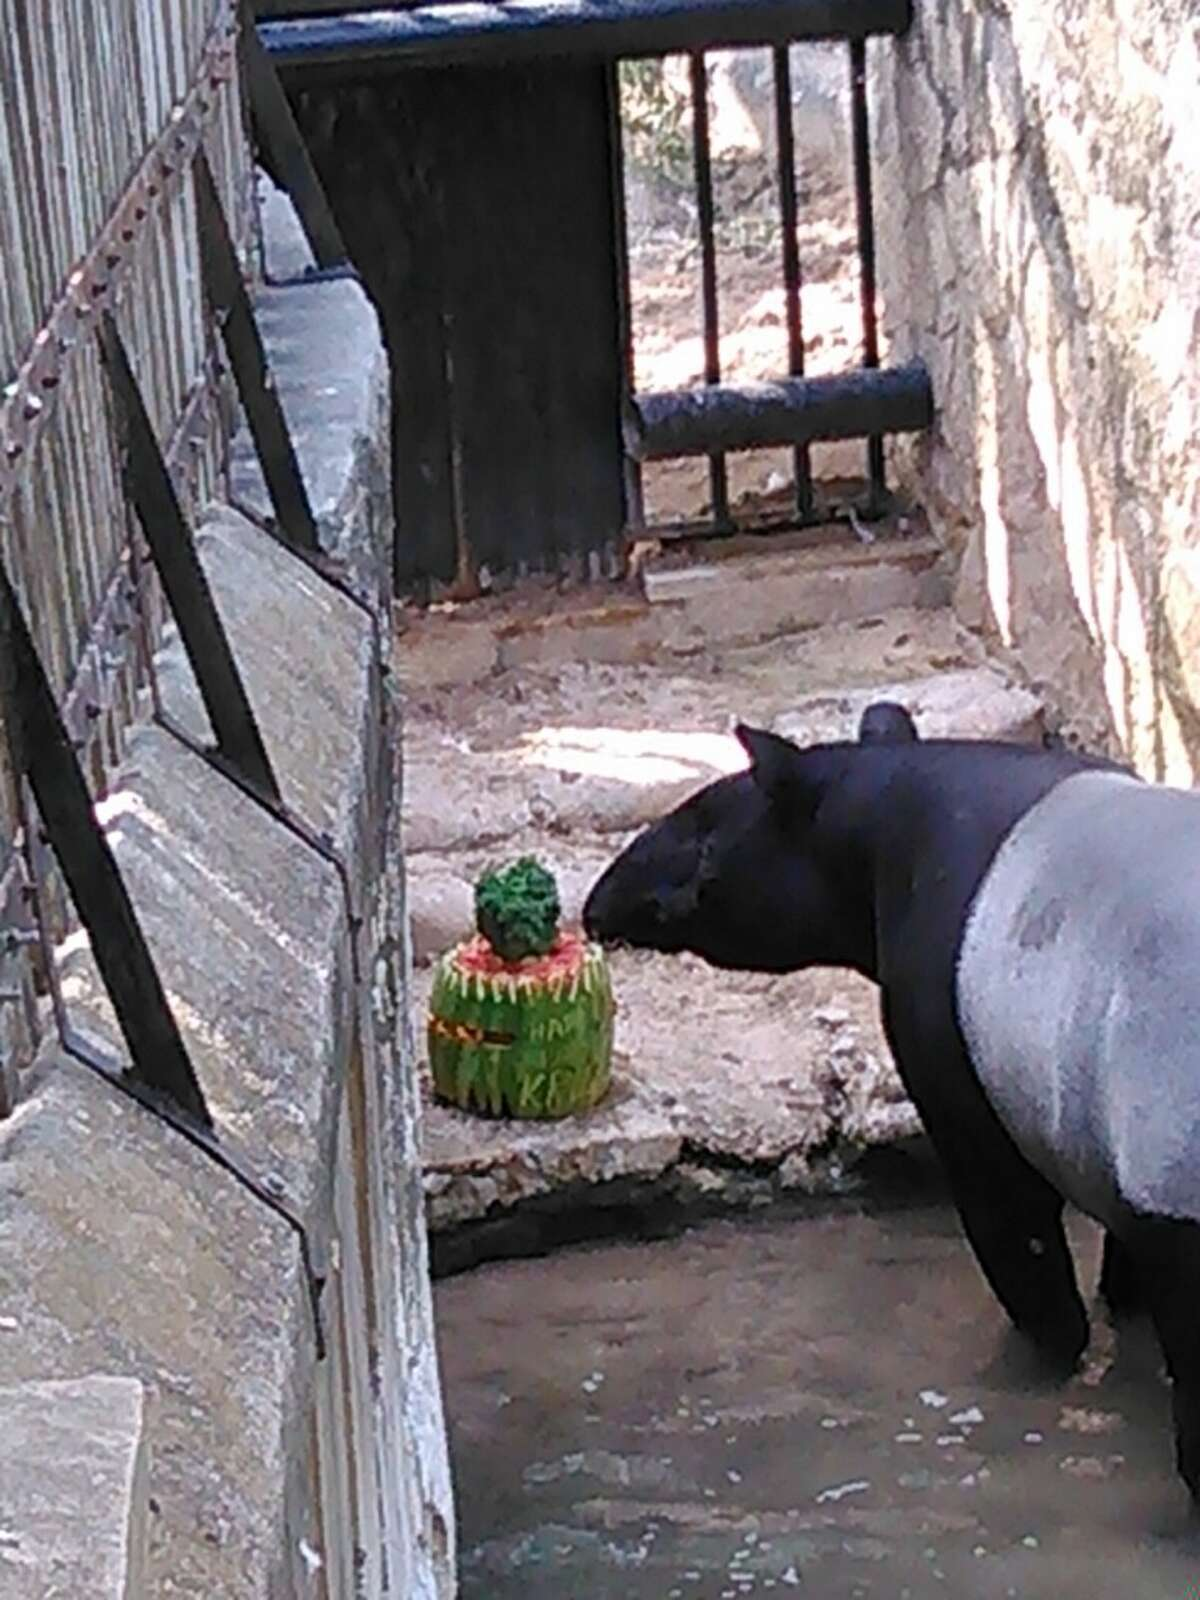 Kruz, a Malaysian Tapir at the San Antonio Zoo, celebrates his birthday with a watermelon cake.